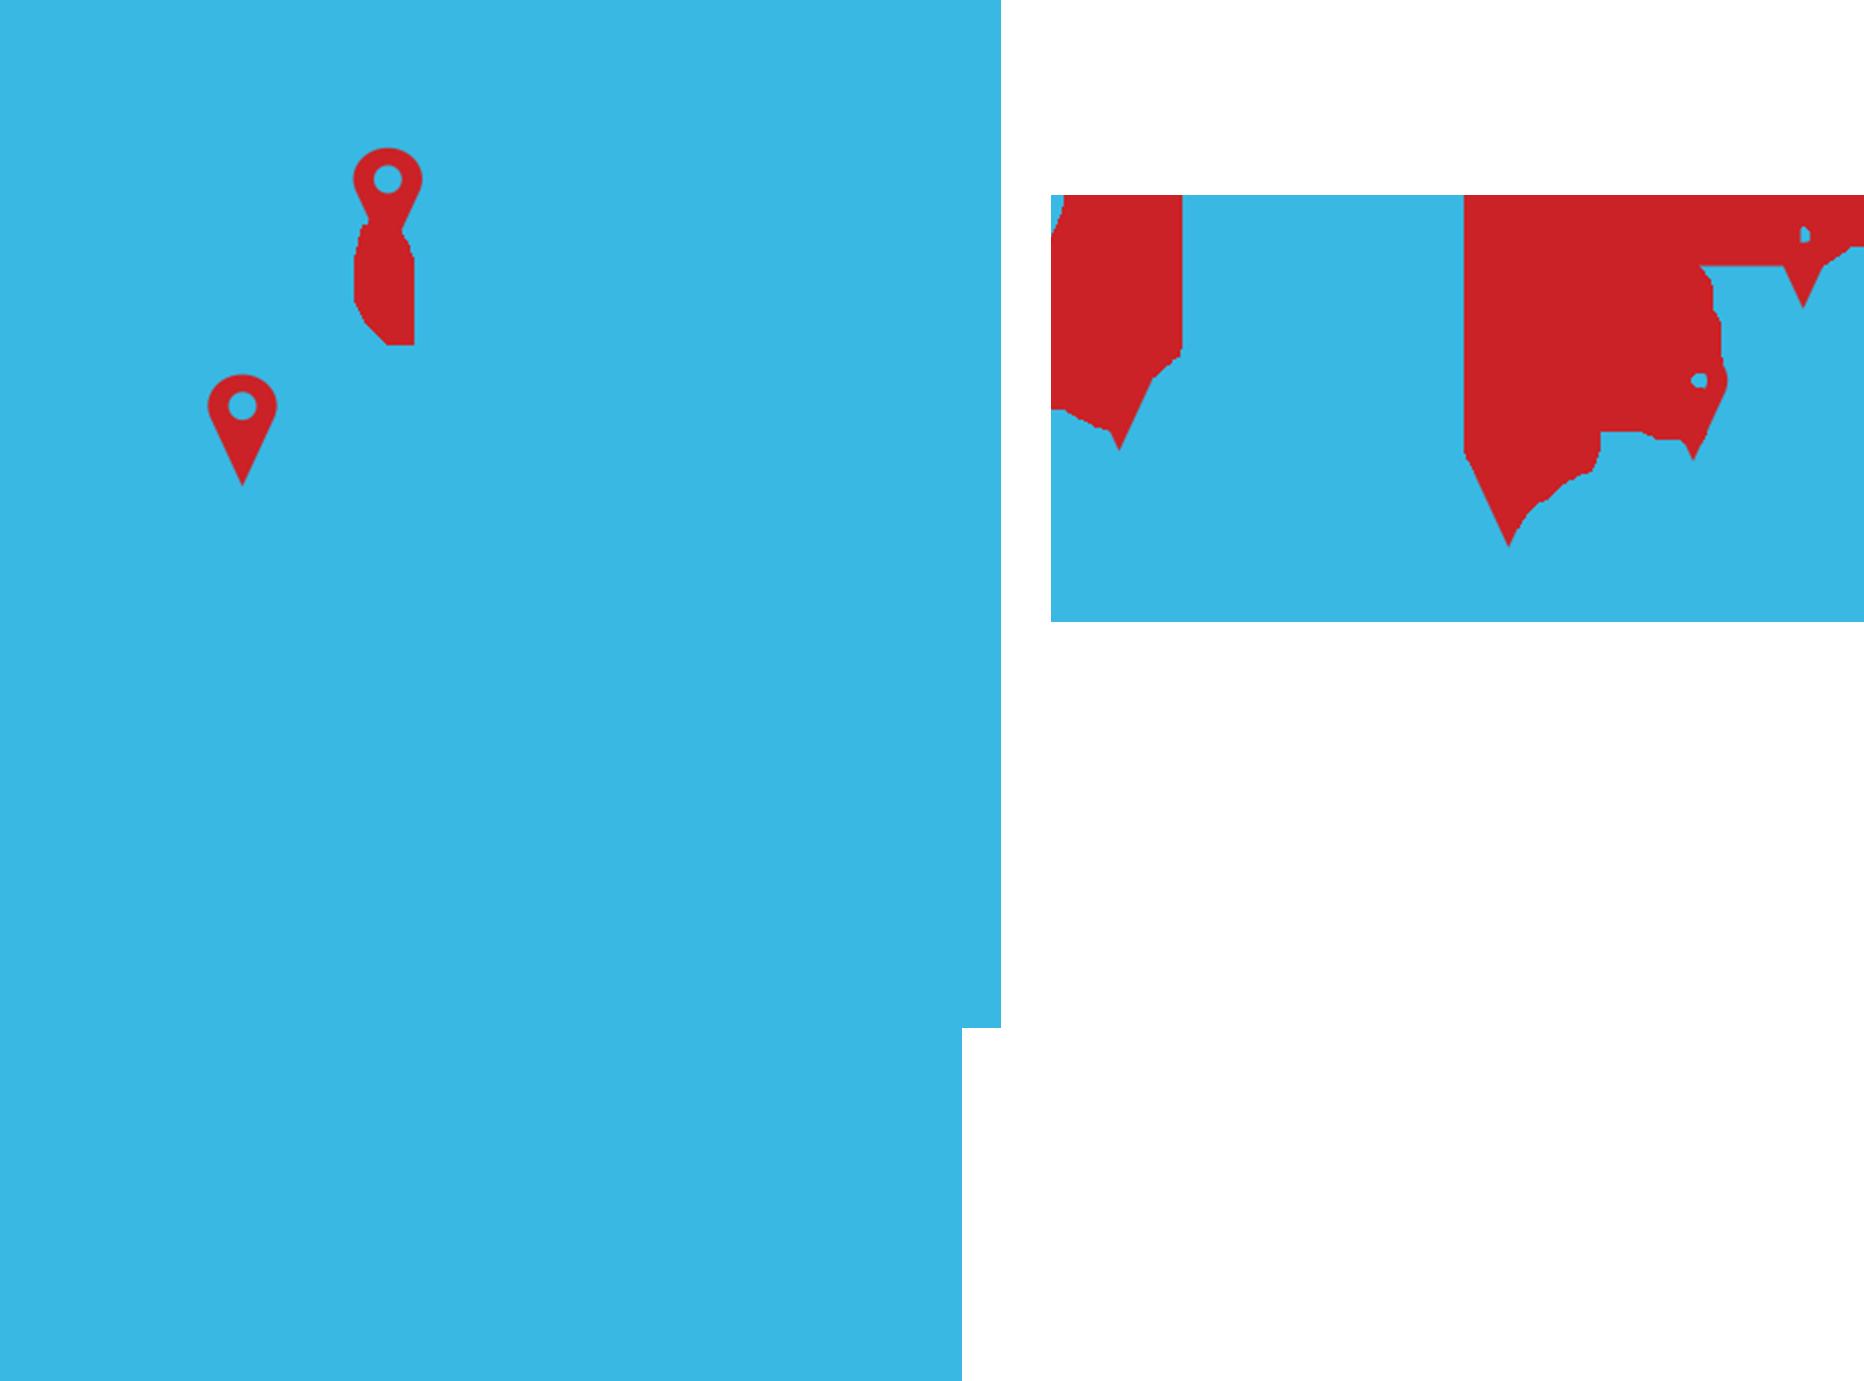 map-image